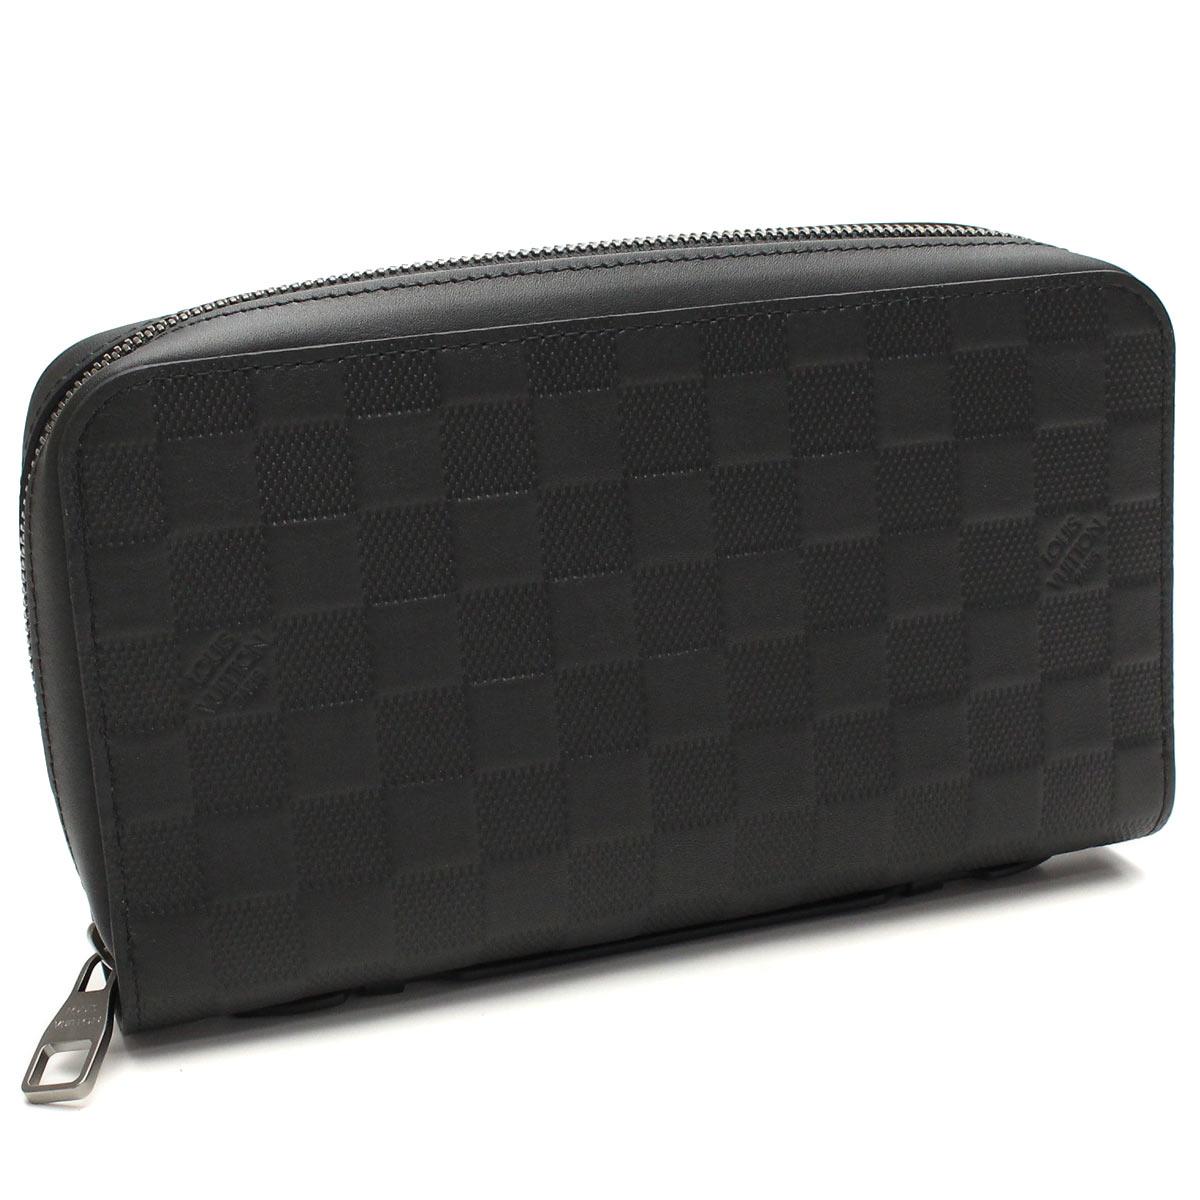 louis vuitton zip wallet. louis vuitton (louis vuitton) damier infini zippy xl zip around wallet n61254 onyx black n